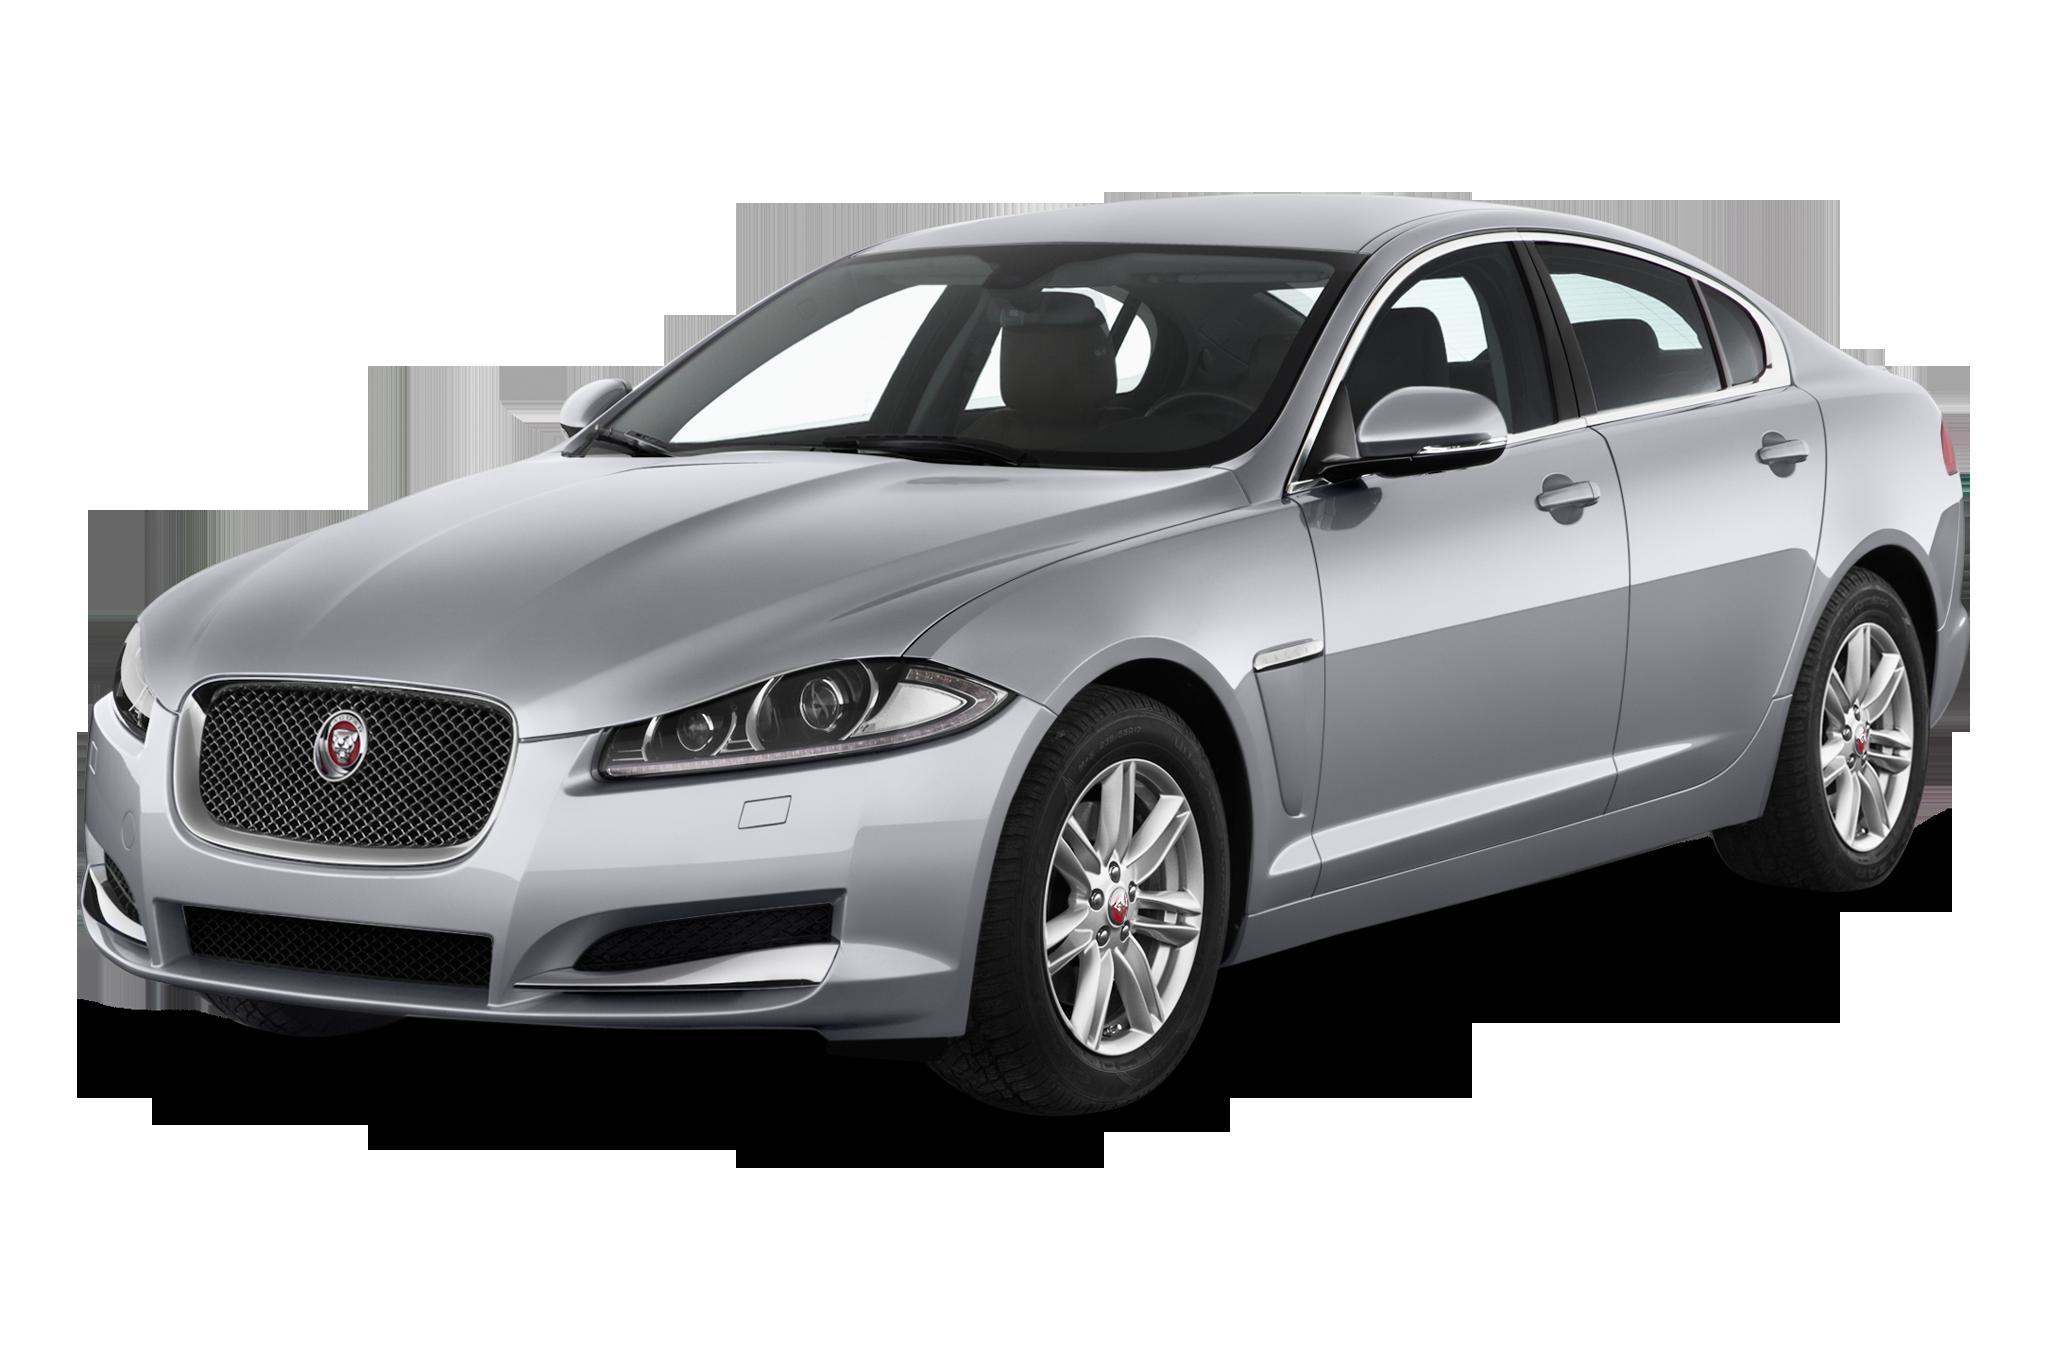 promote news sedan competitors to camos xe autoevolution jaguar